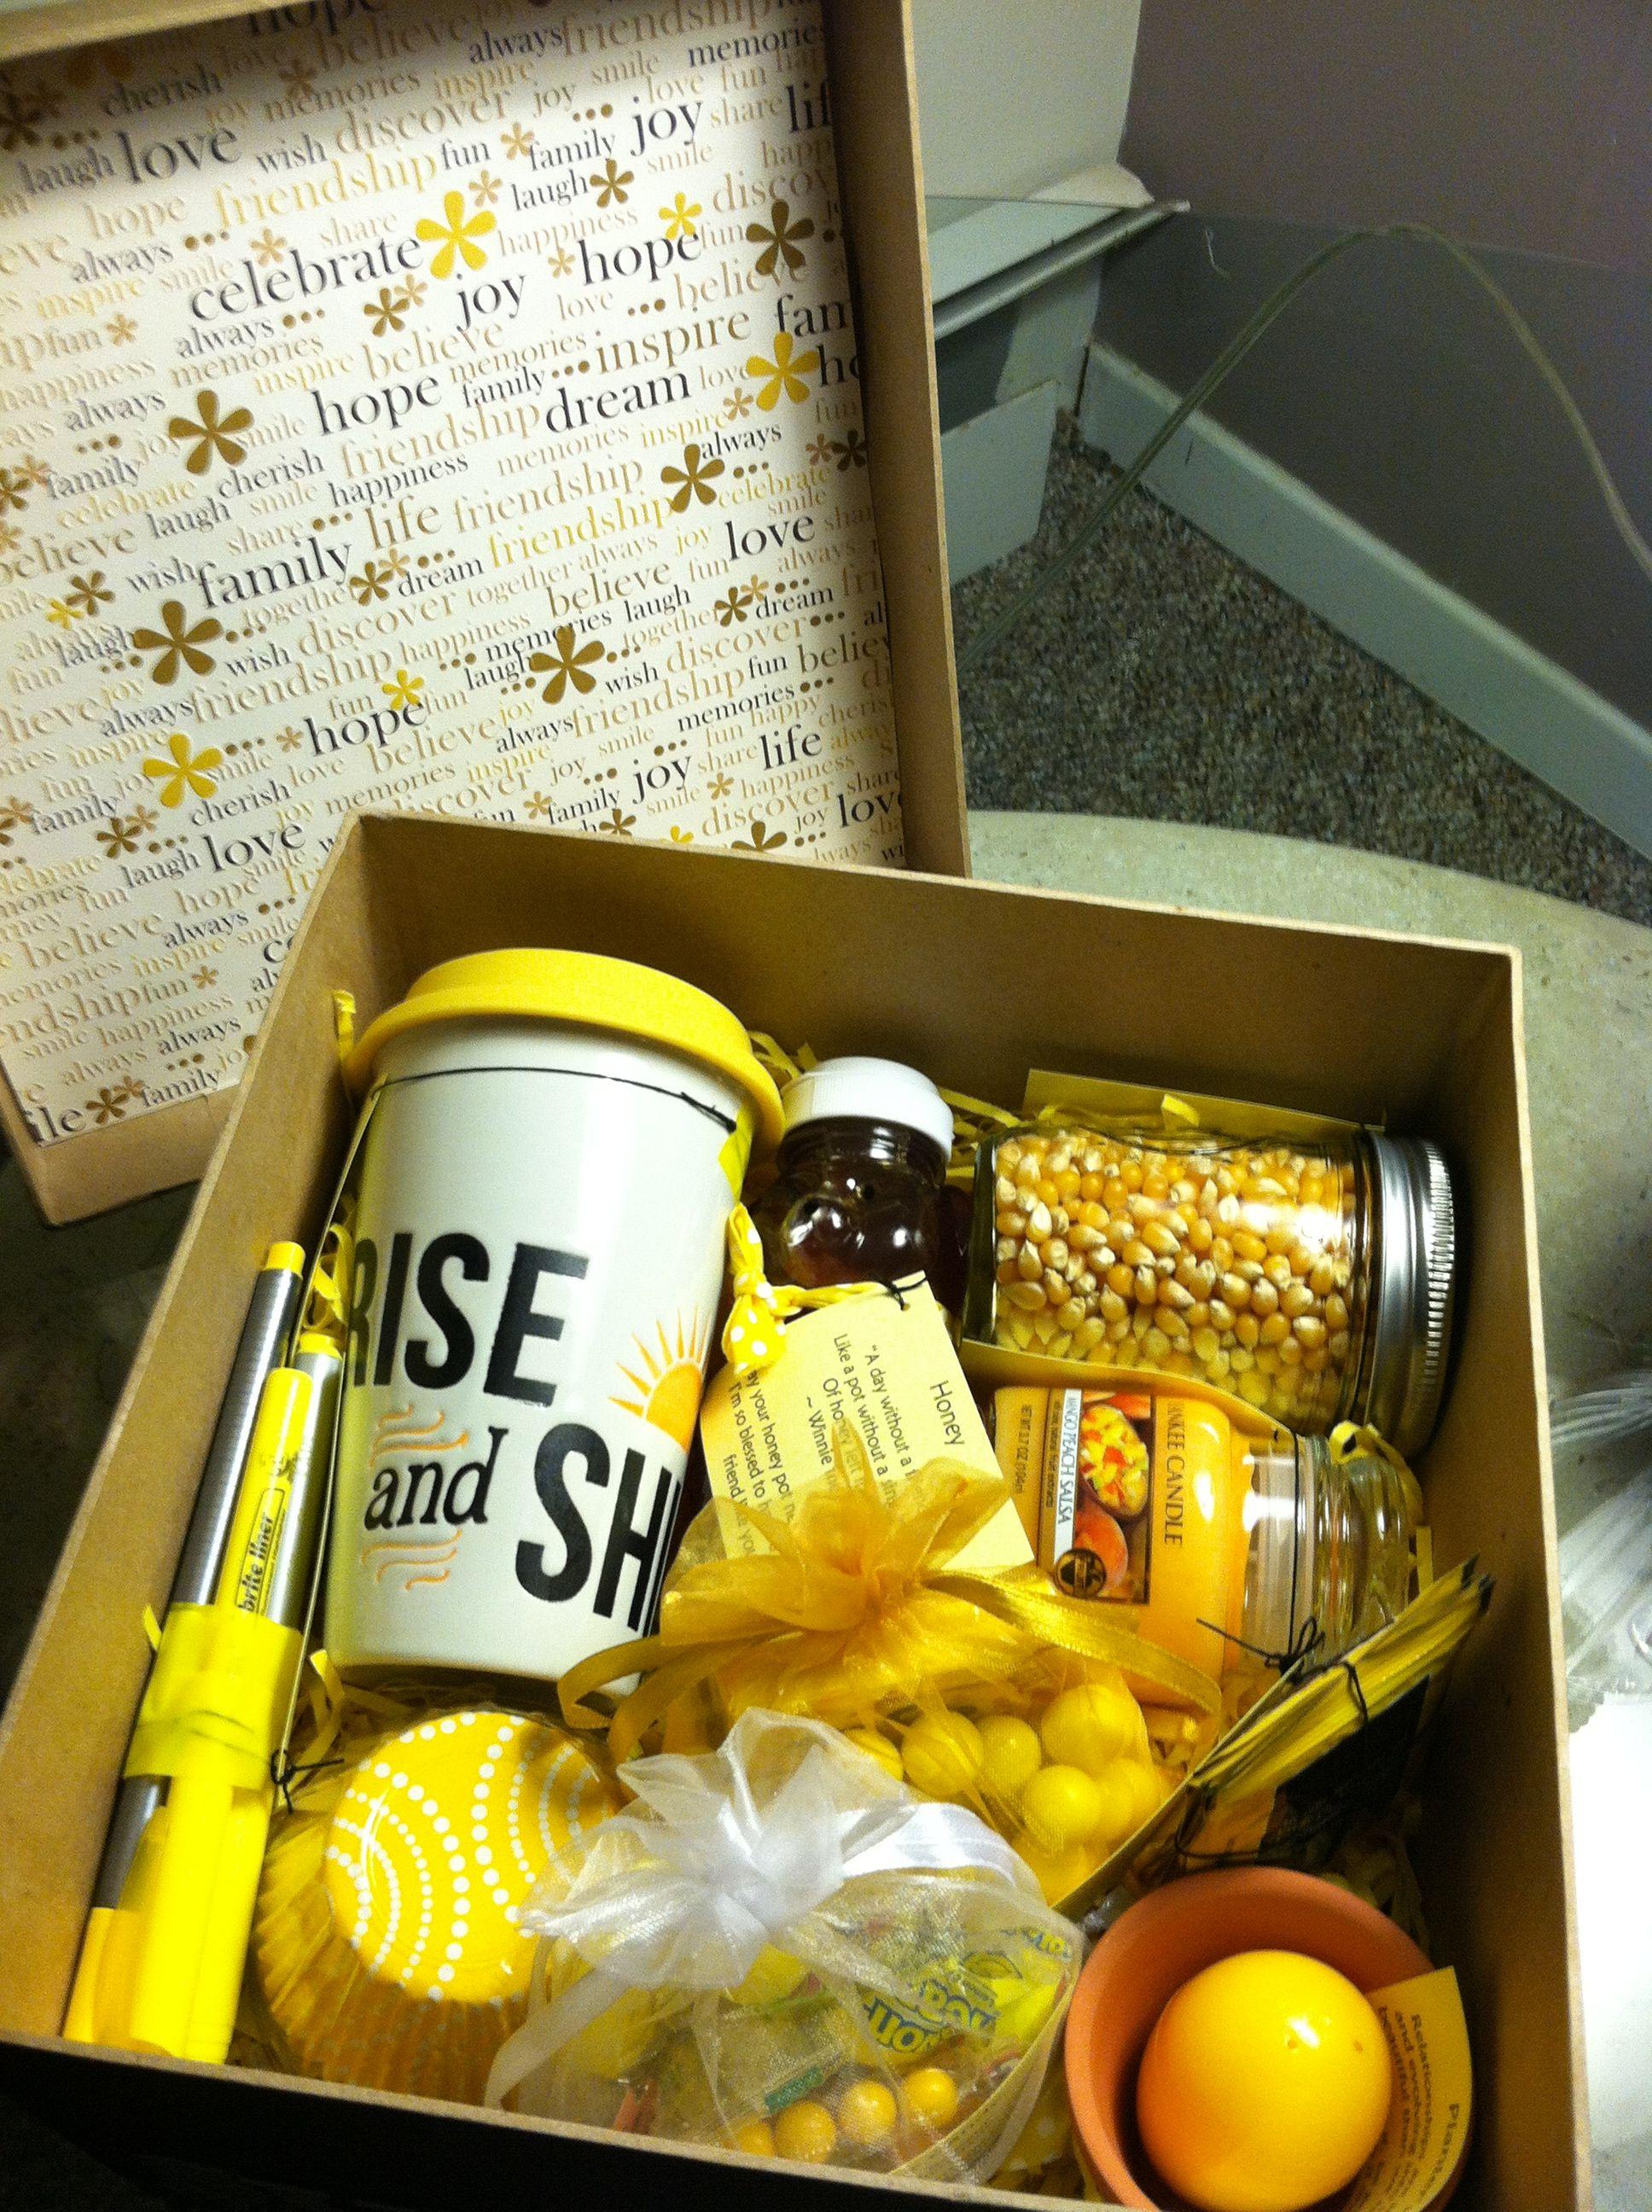 Little Box of Sunshine to brighten someone's day